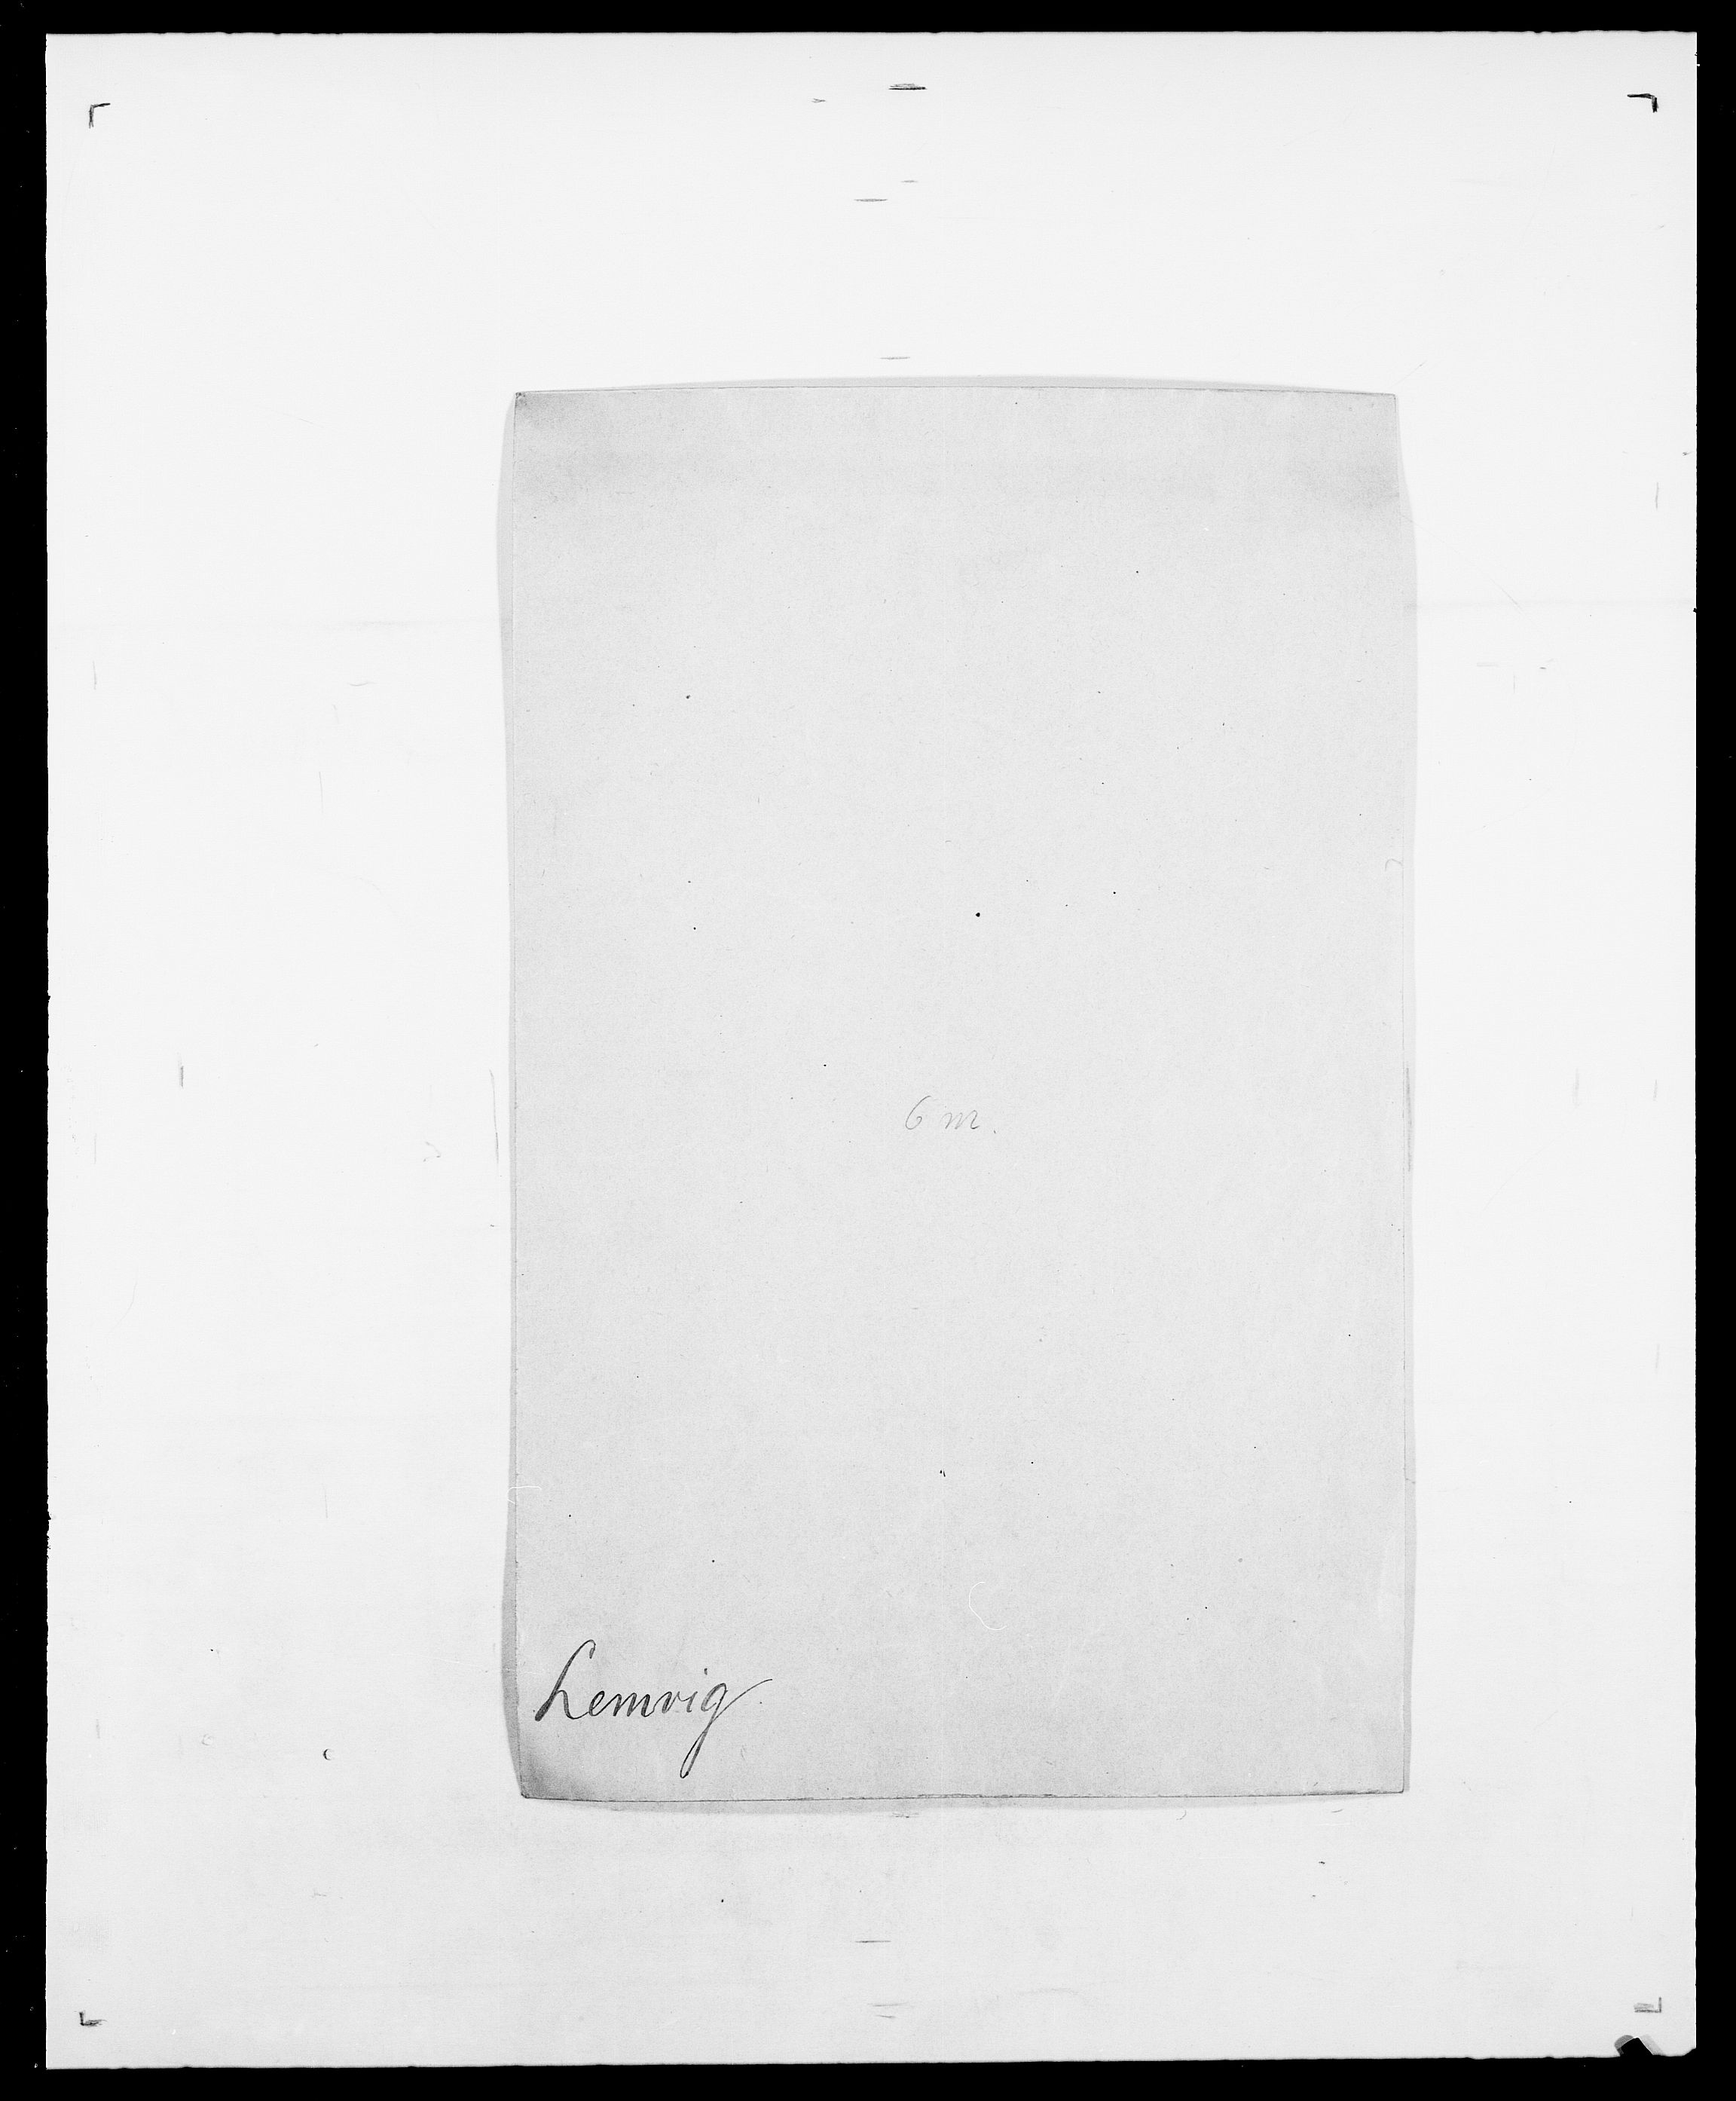 SAO, Delgobe, Charles Antoine - samling, D/Da/L0023: Lau - Lirvyn, s. 198